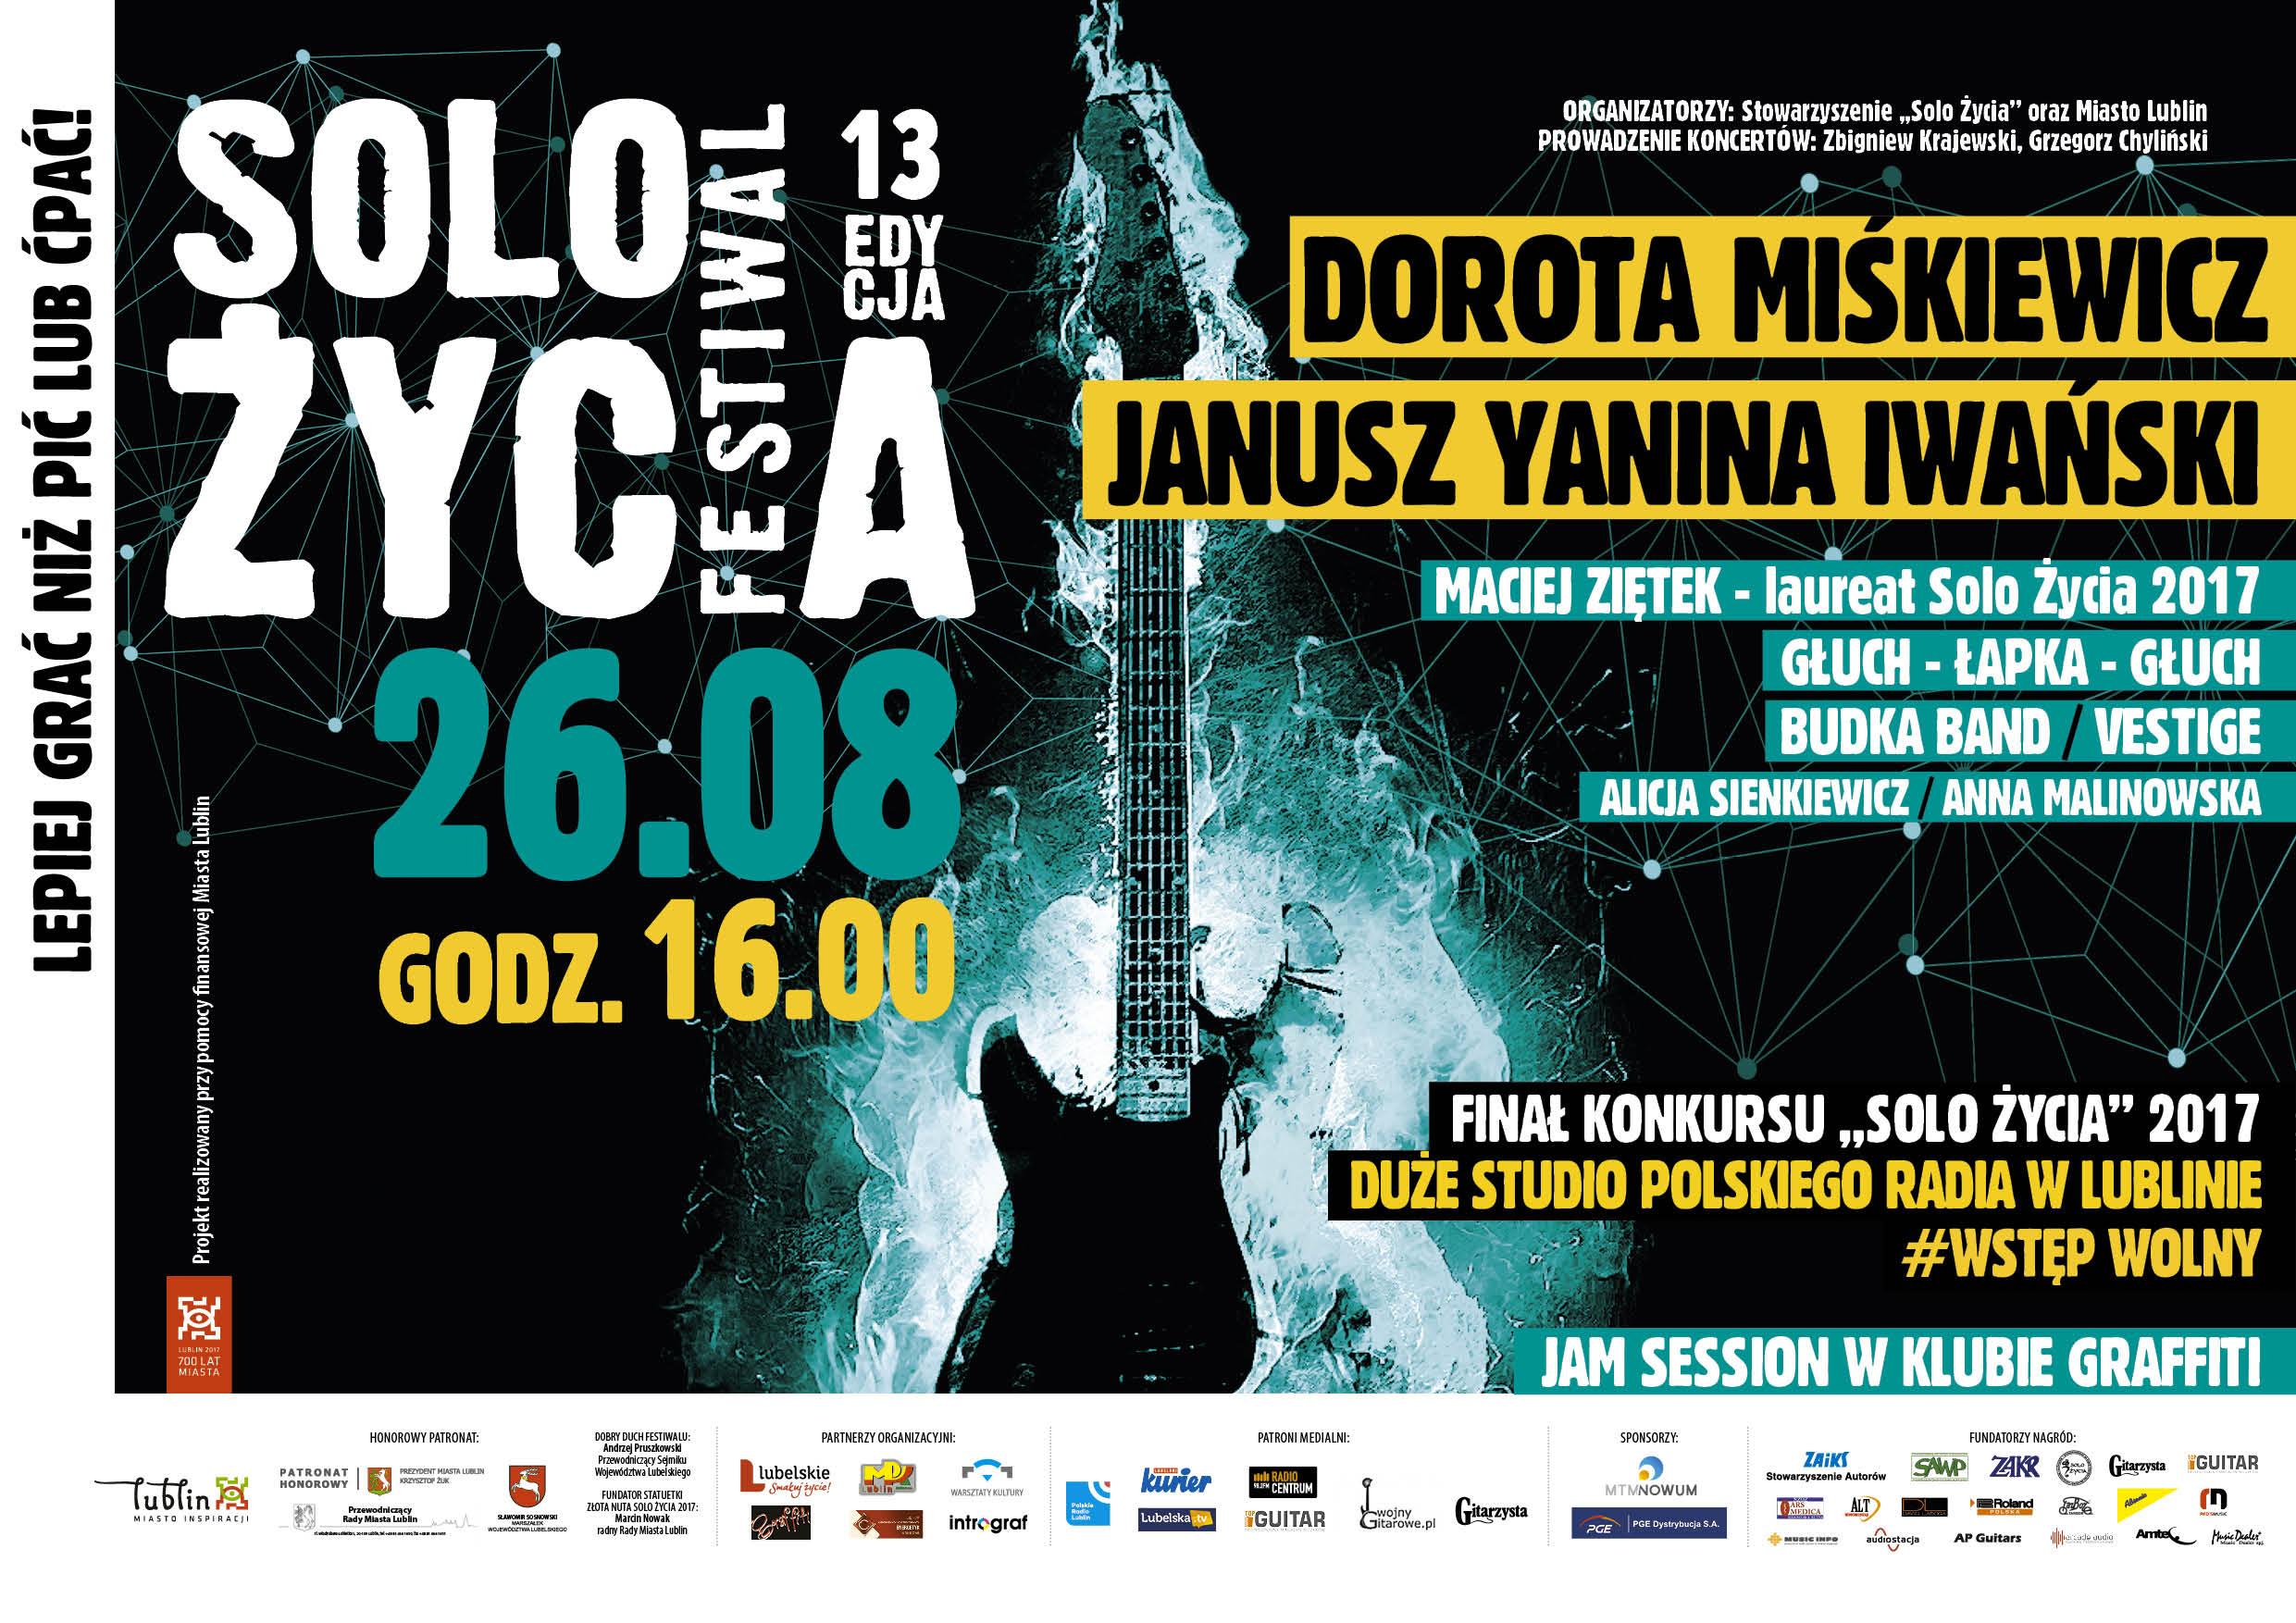 SOLO-ZYCIA_Plakat-A3-_PODGLAD.jpg